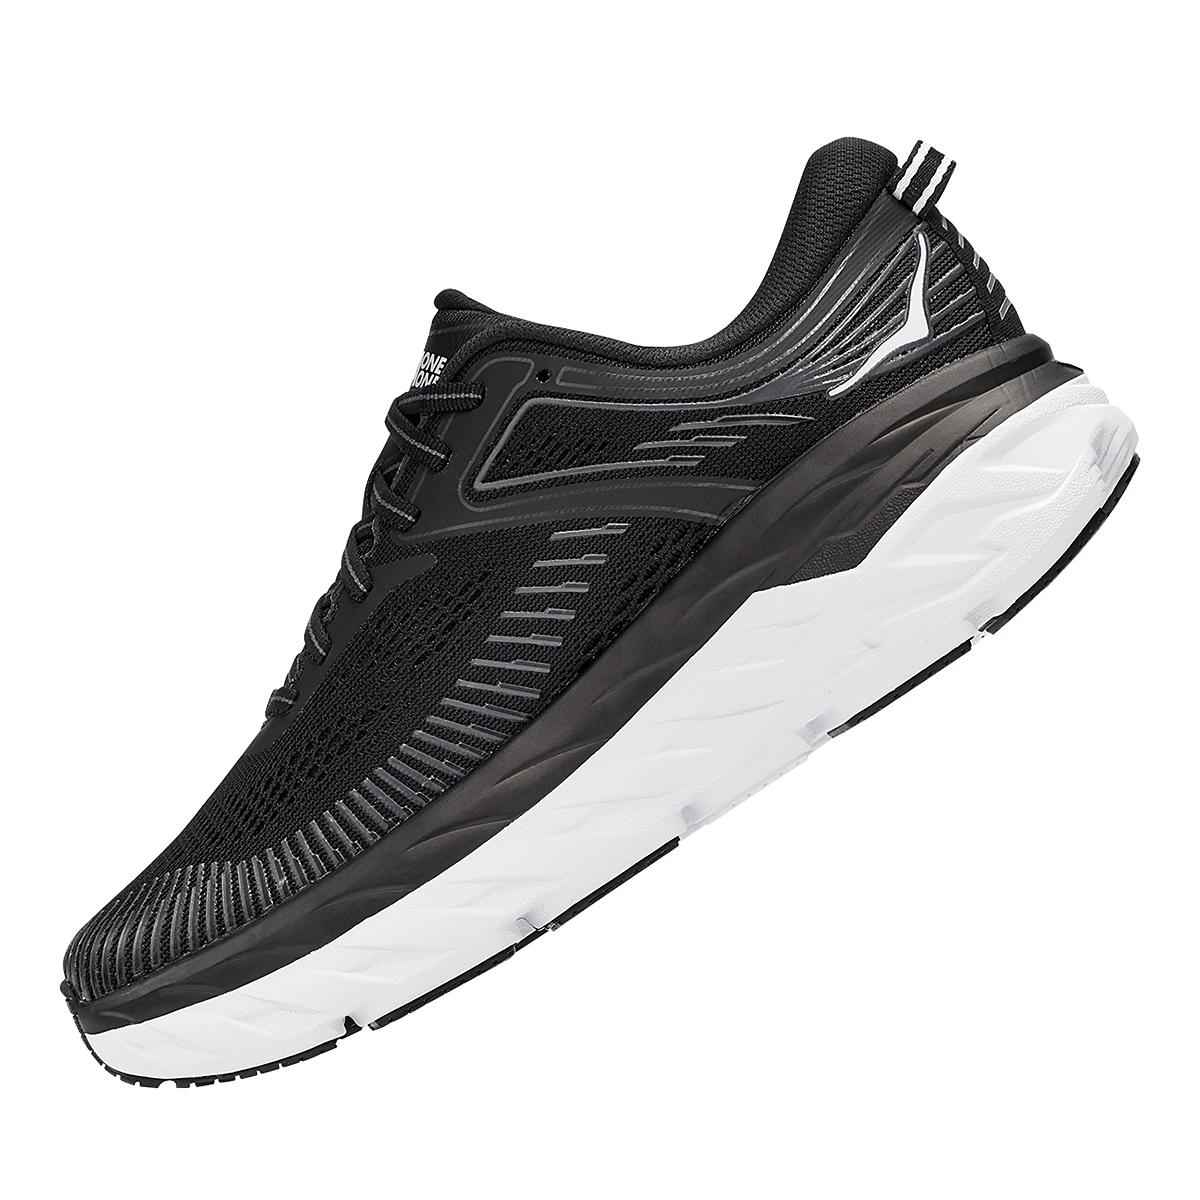 Women's Hoka One One Bondi 7 Running Shoe - Color: Black/White - Size: 5 - Width: Regular, Black/White, large, image 4